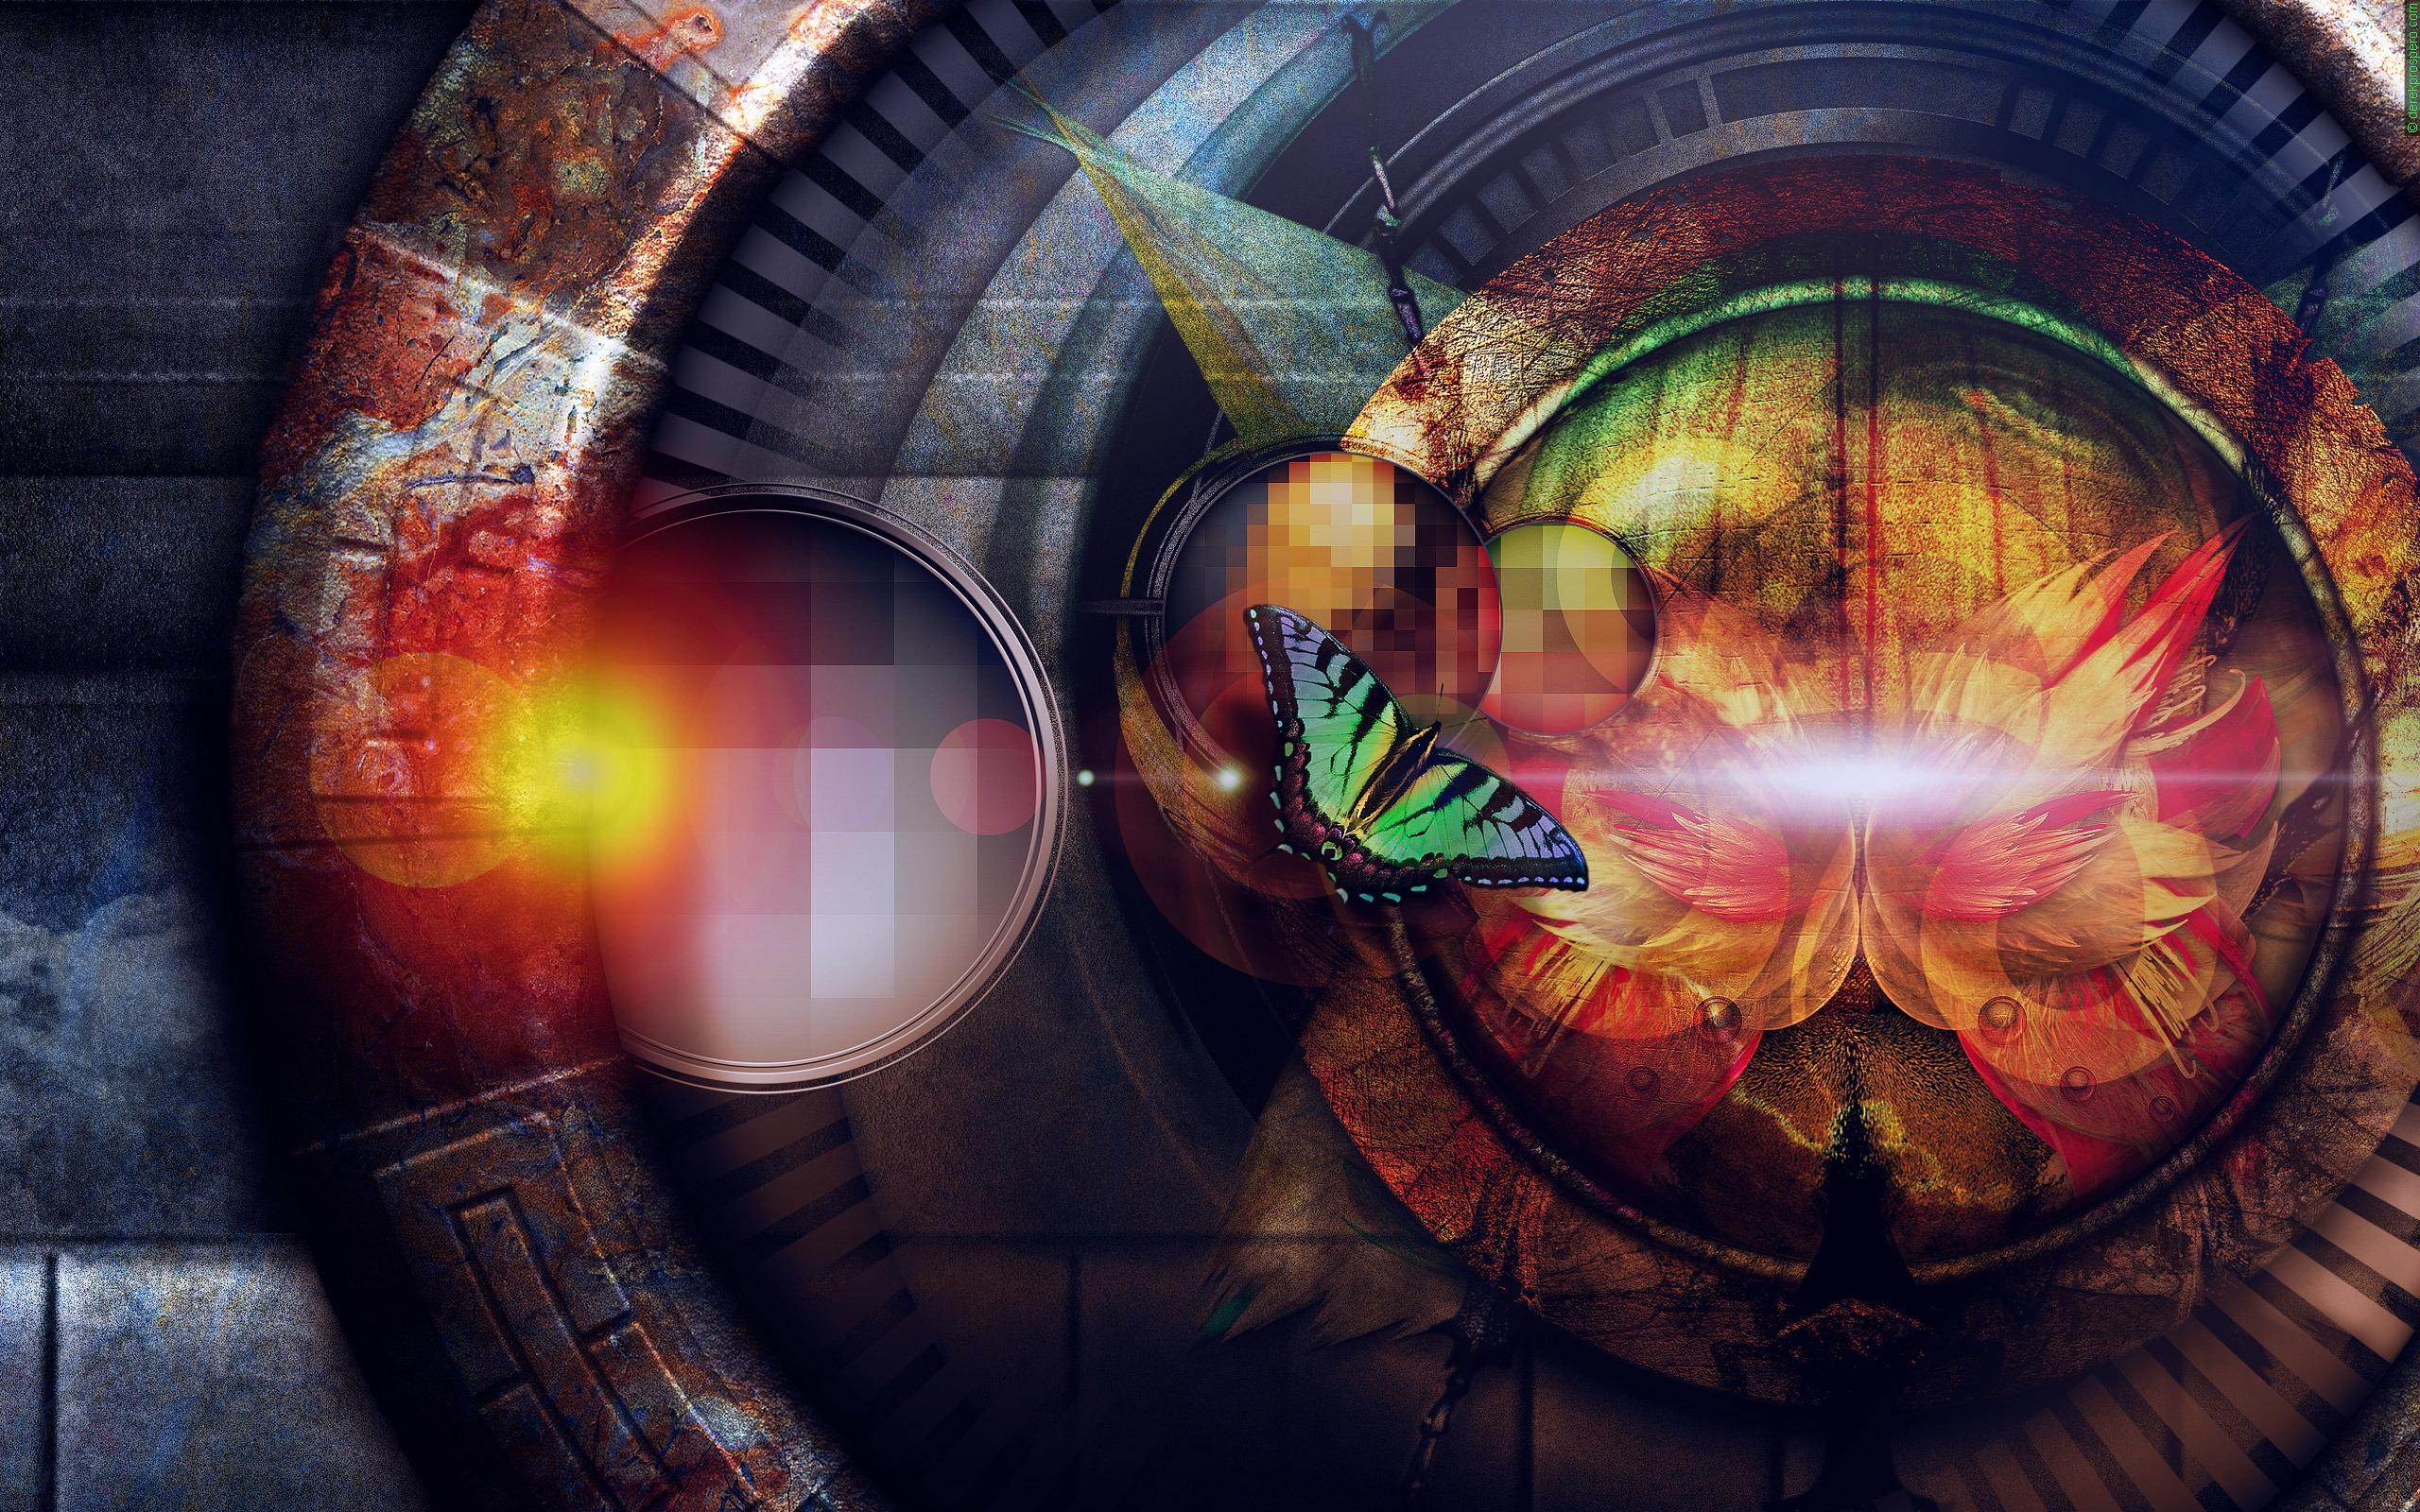 cgi hd wallpaper | background image | 2560x1600 | id:104352